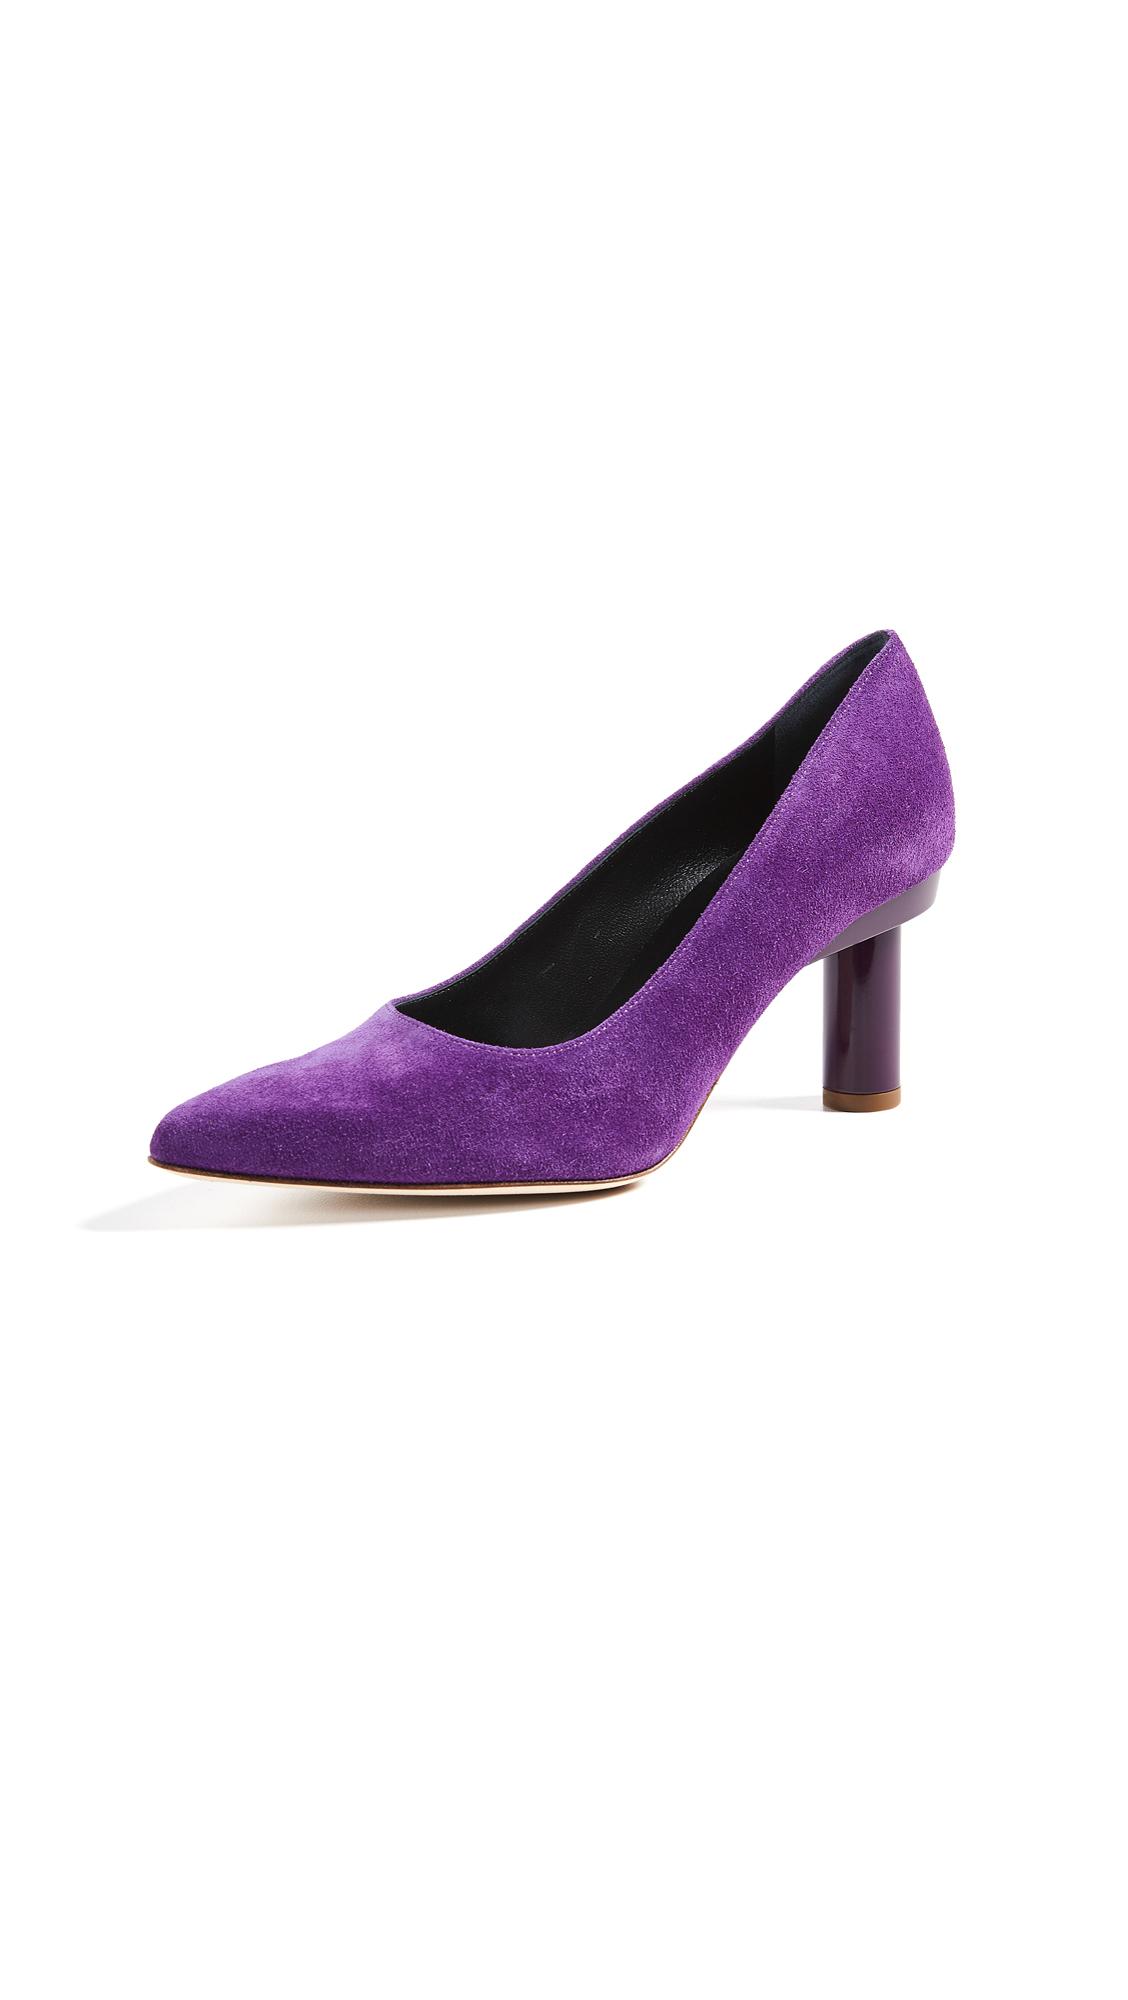 Tibi ZO Pumps - Violet